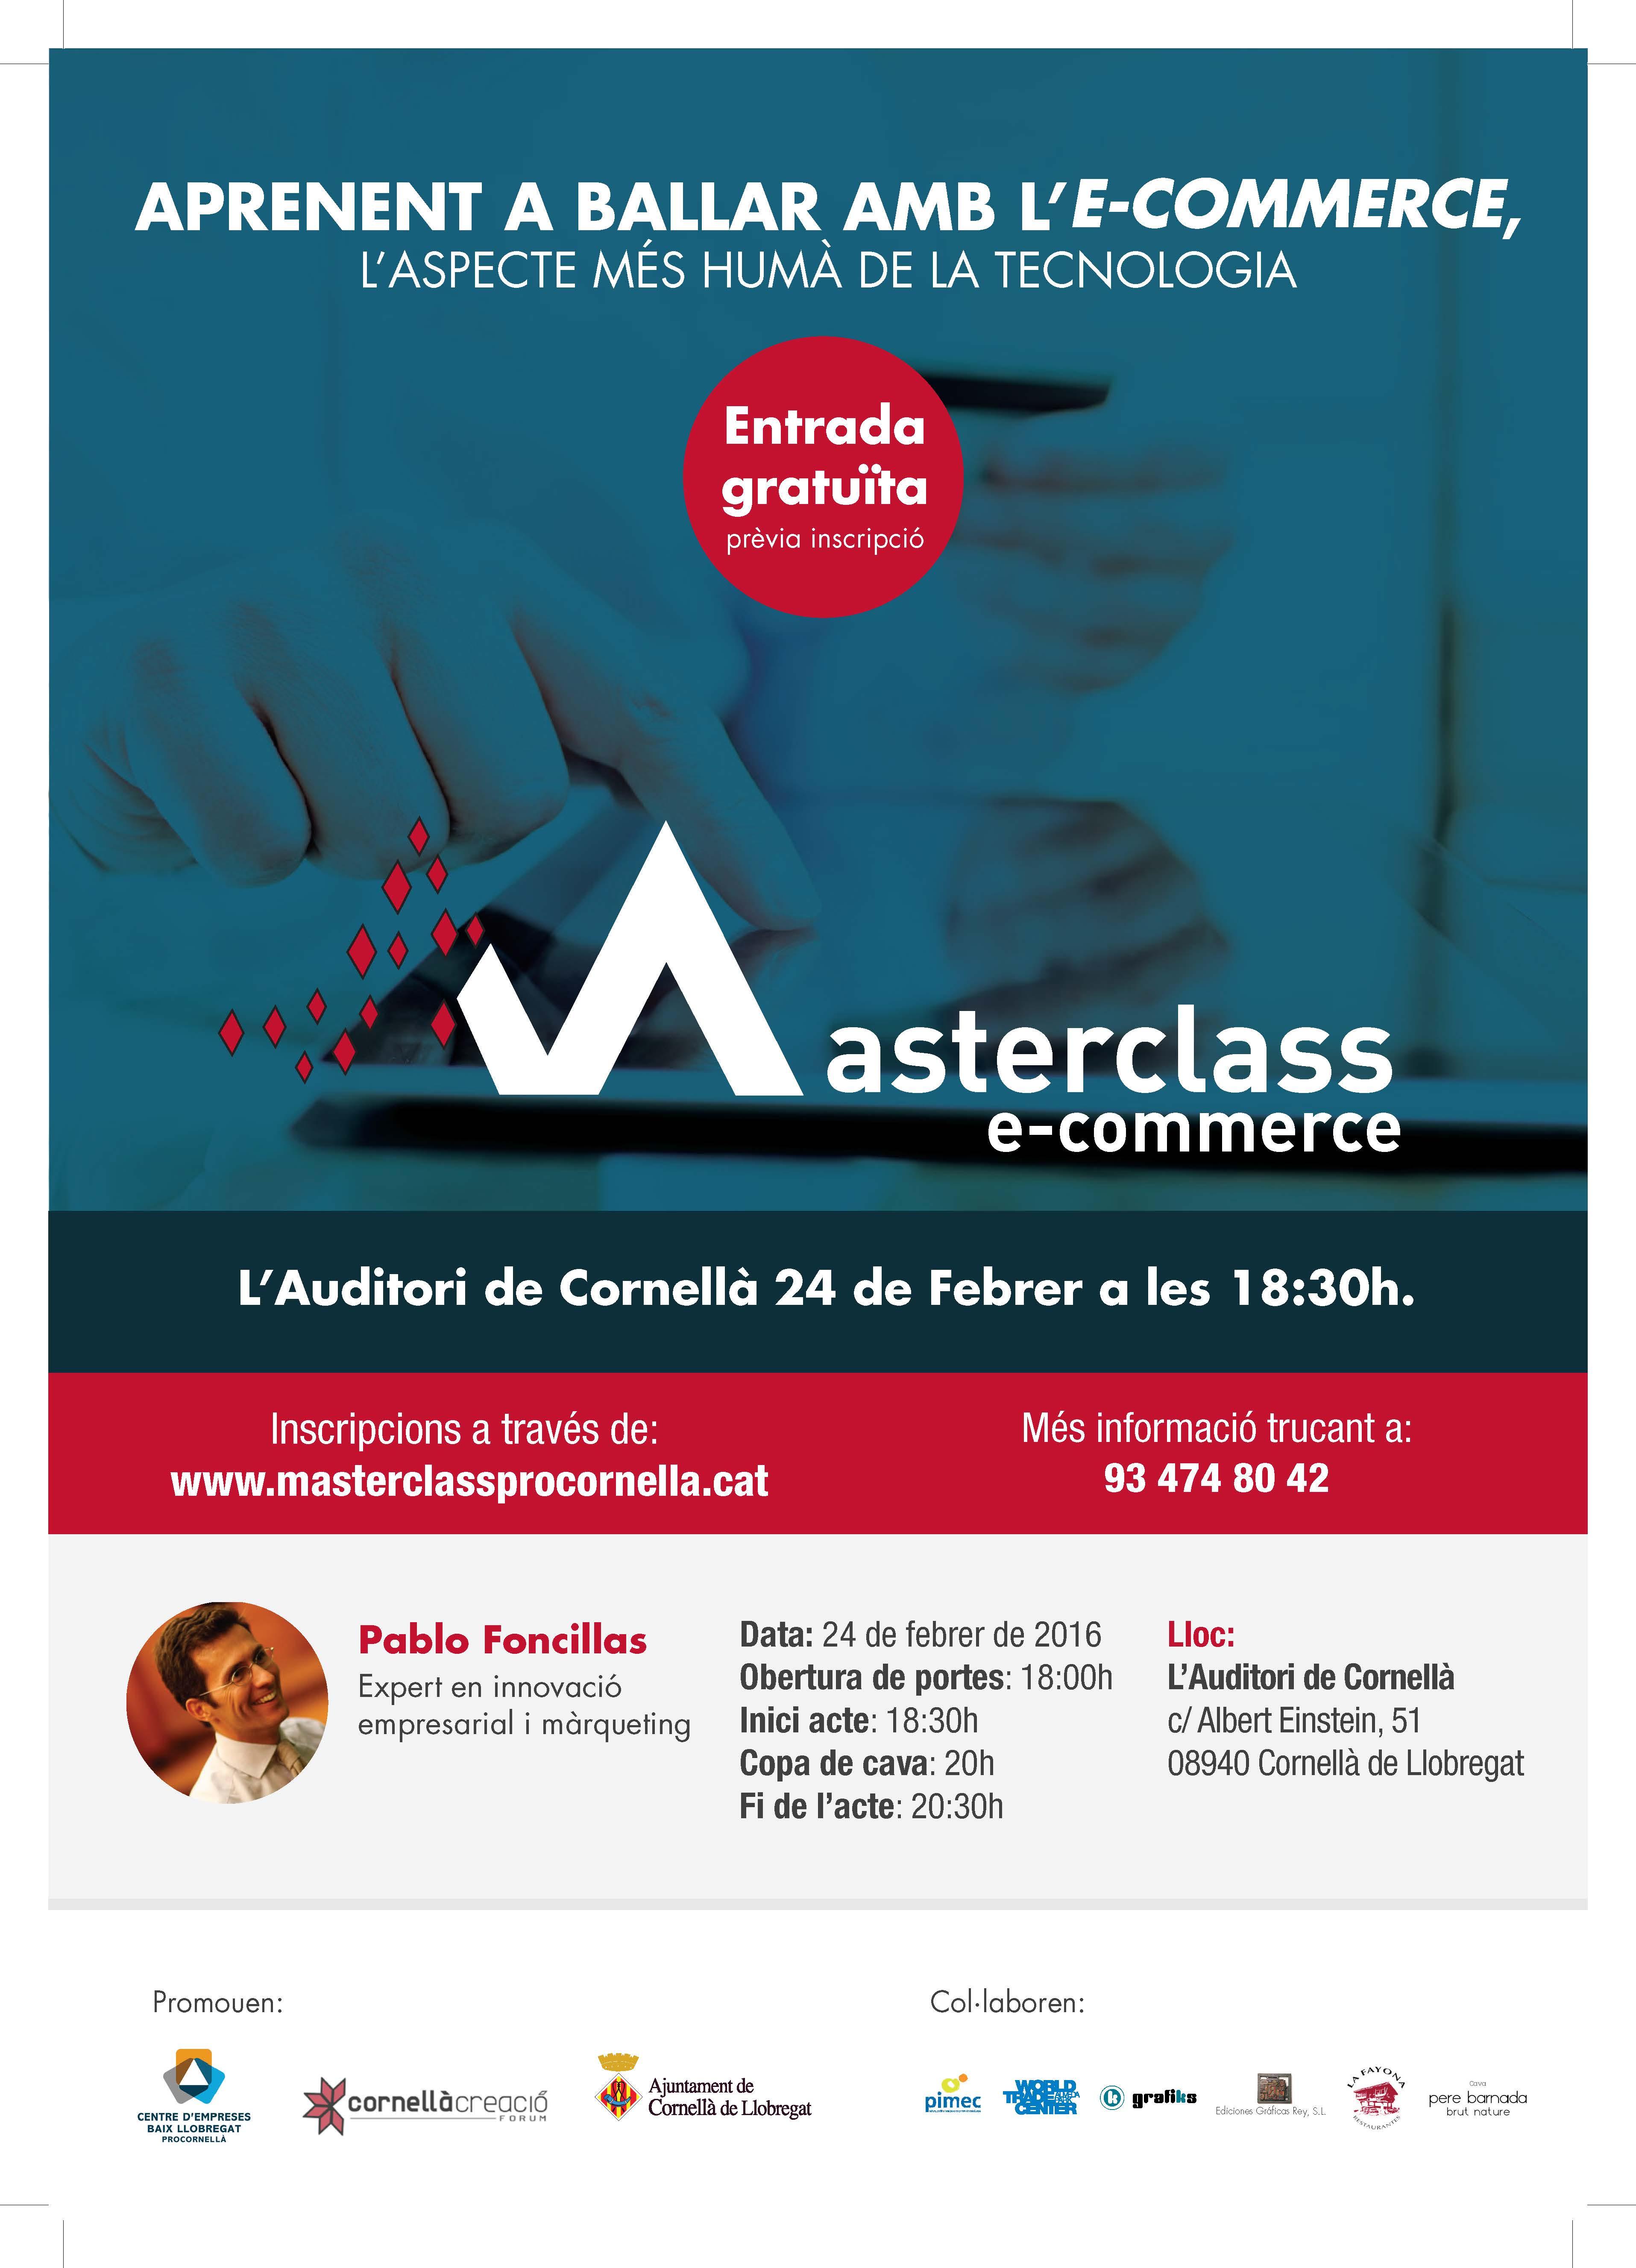 Masterclass_ecommerce (3)